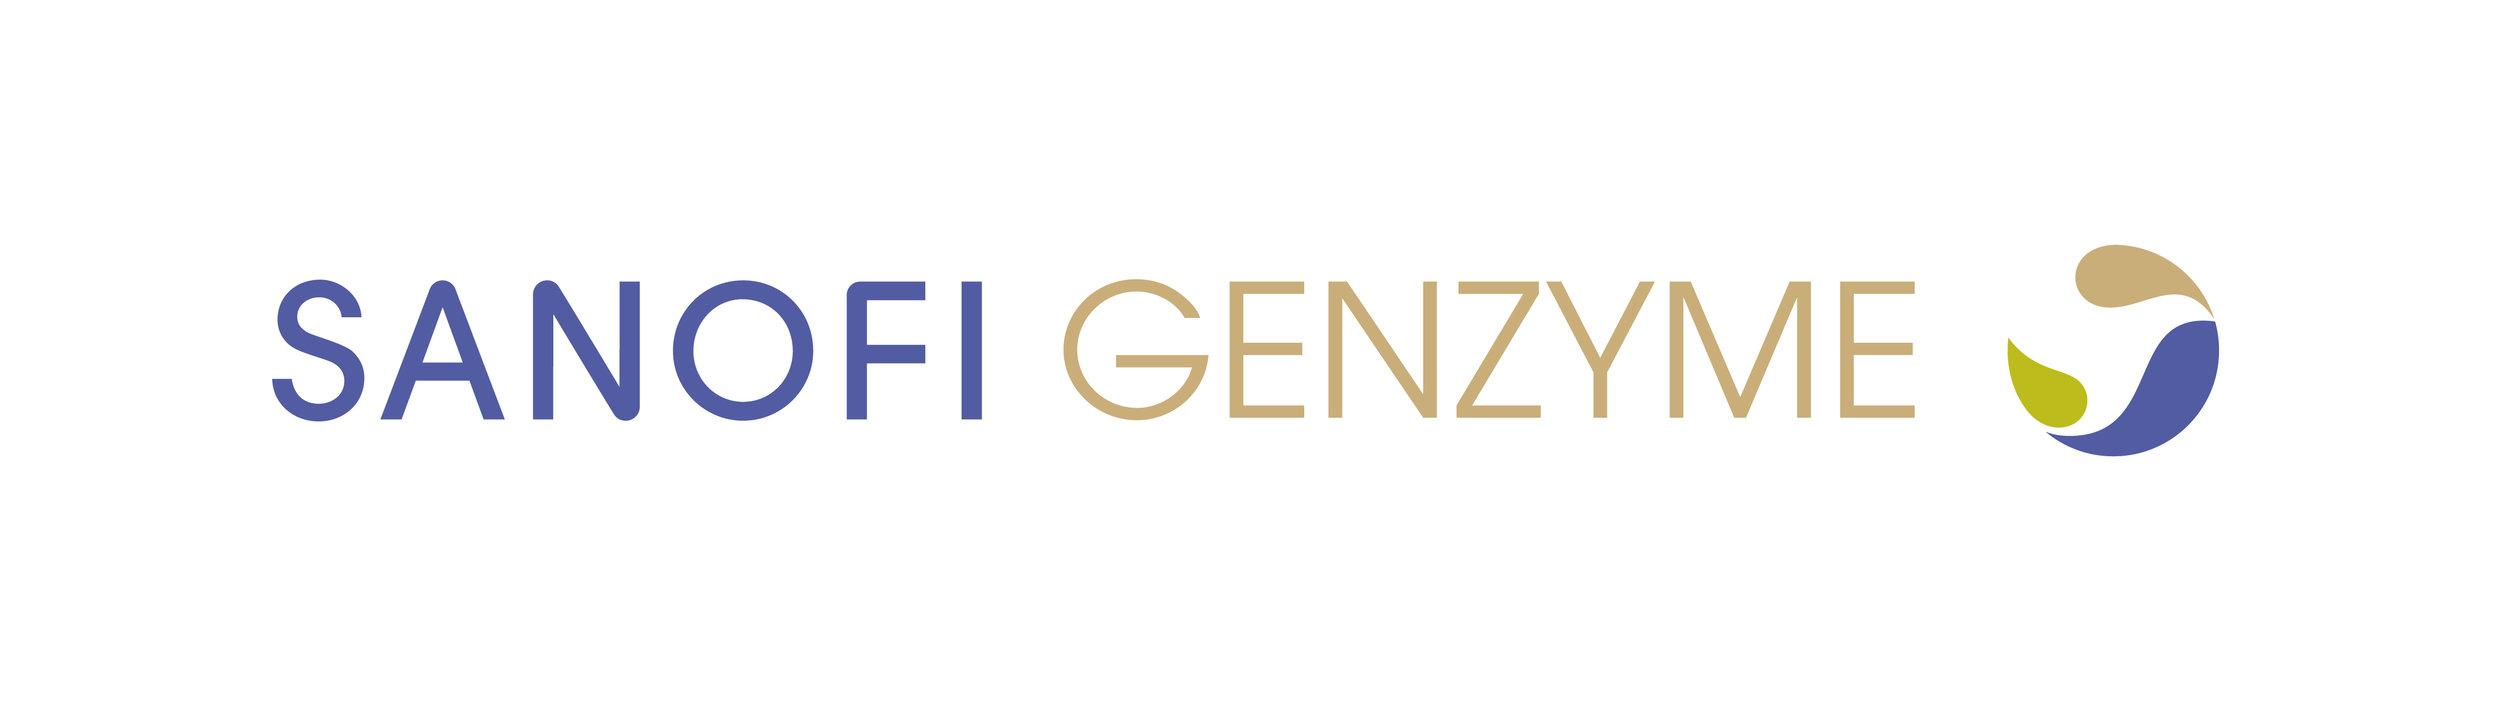 SANOFI_Genzyme_RVB_horizontal logo (002).jpg